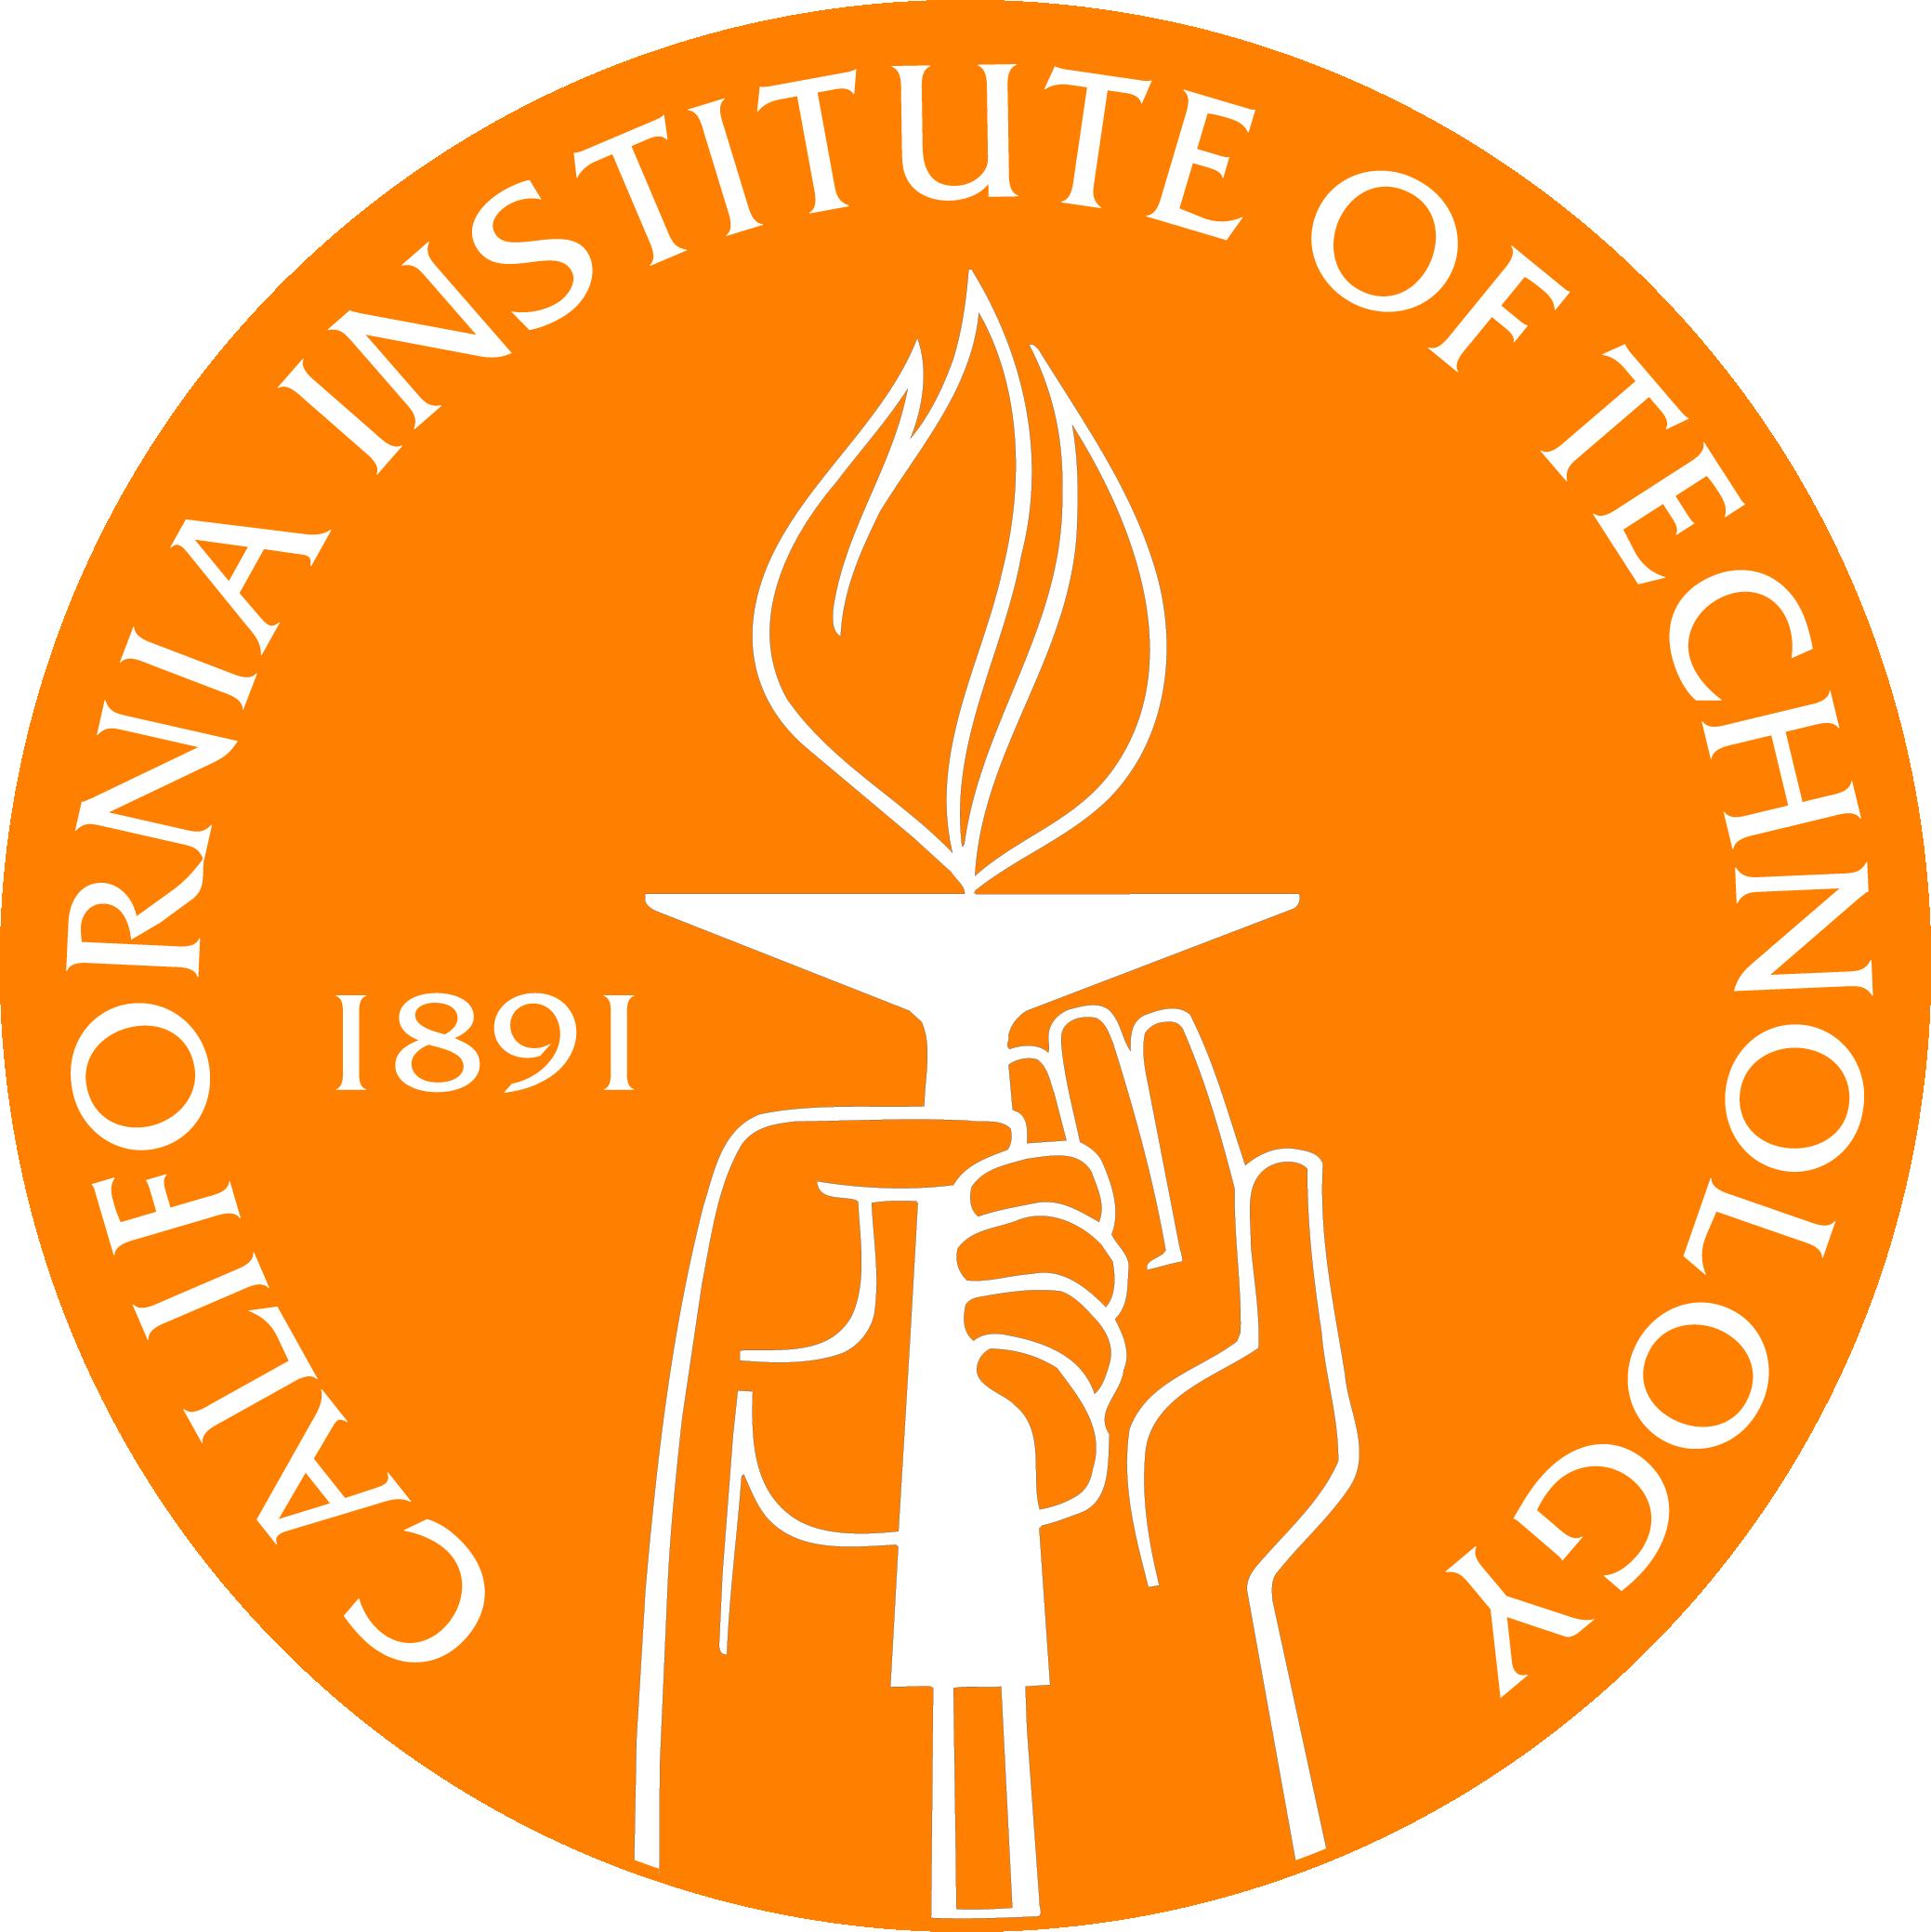 Image source: www.stathlab.caltech.edu